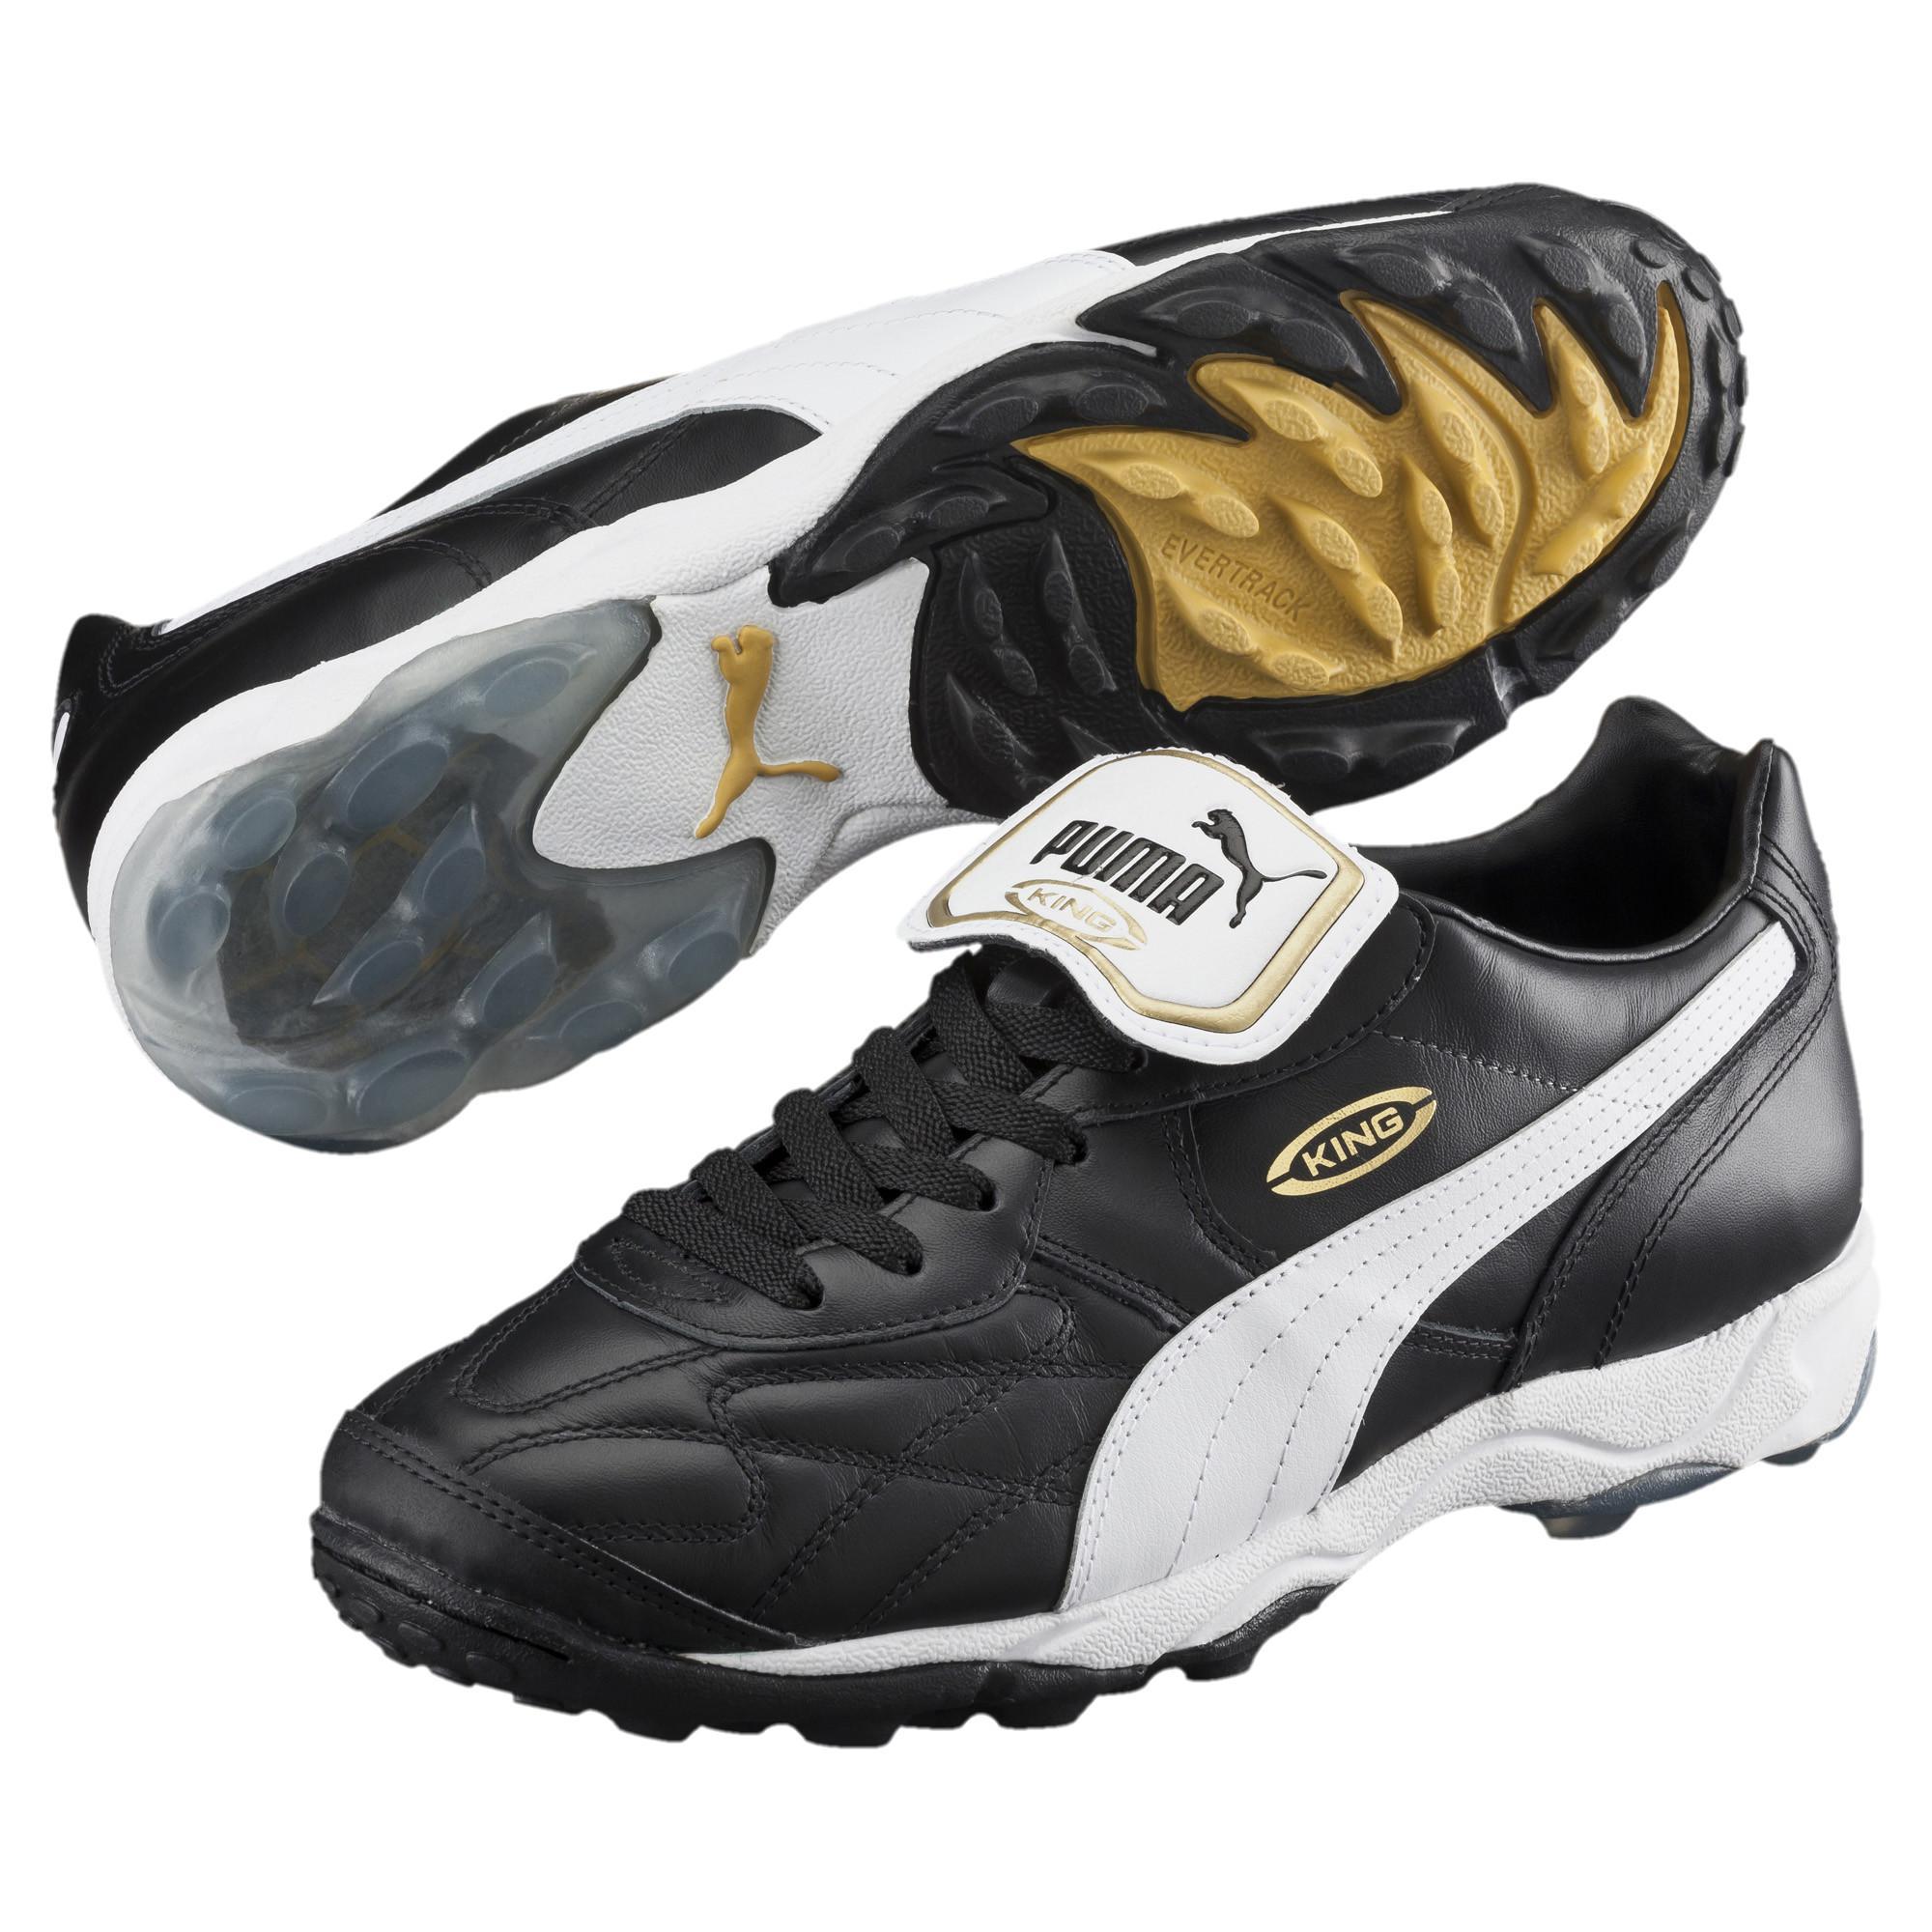 71ecf7ac6b4b PUMA - Black Soccer Shoe King Allround Tt for Men - Lyst. View fullscreen